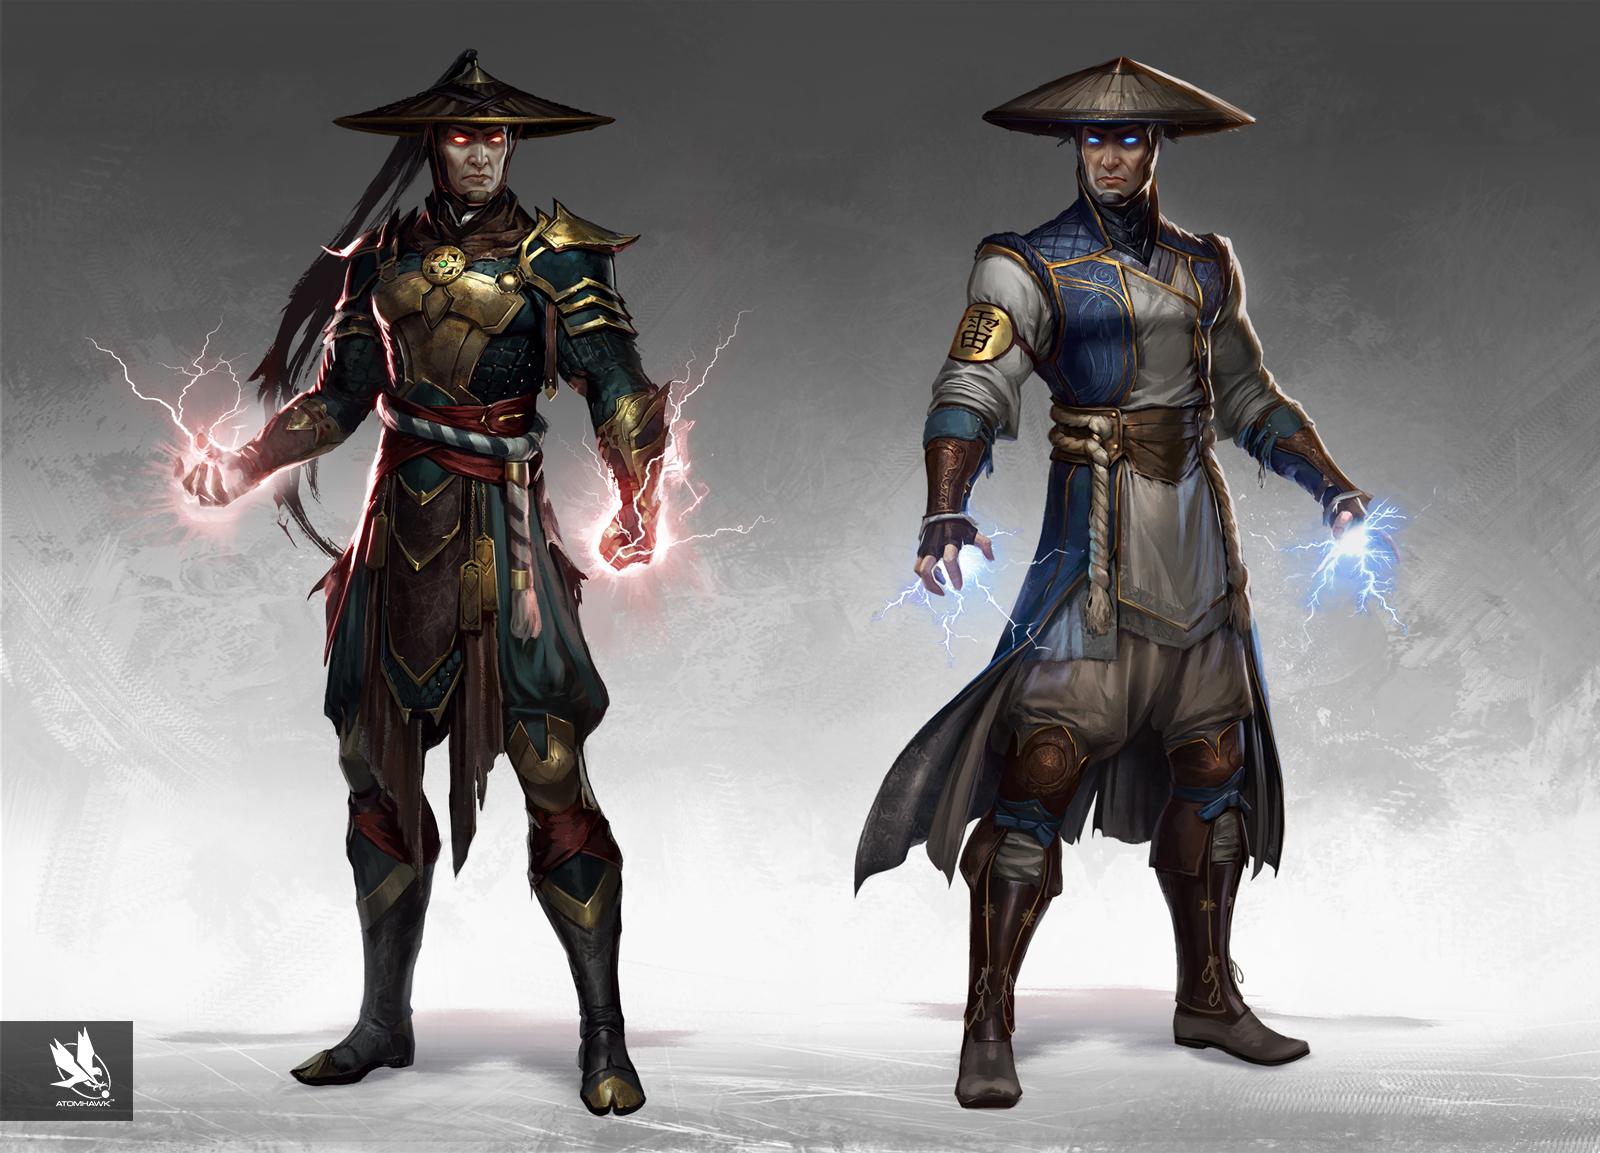 Atomhawk_Warner-Bros-NetherRealm_Mortal-Kombat-11_Concept-Art_Character-Design_Side-by-Side_Raiden.jpg